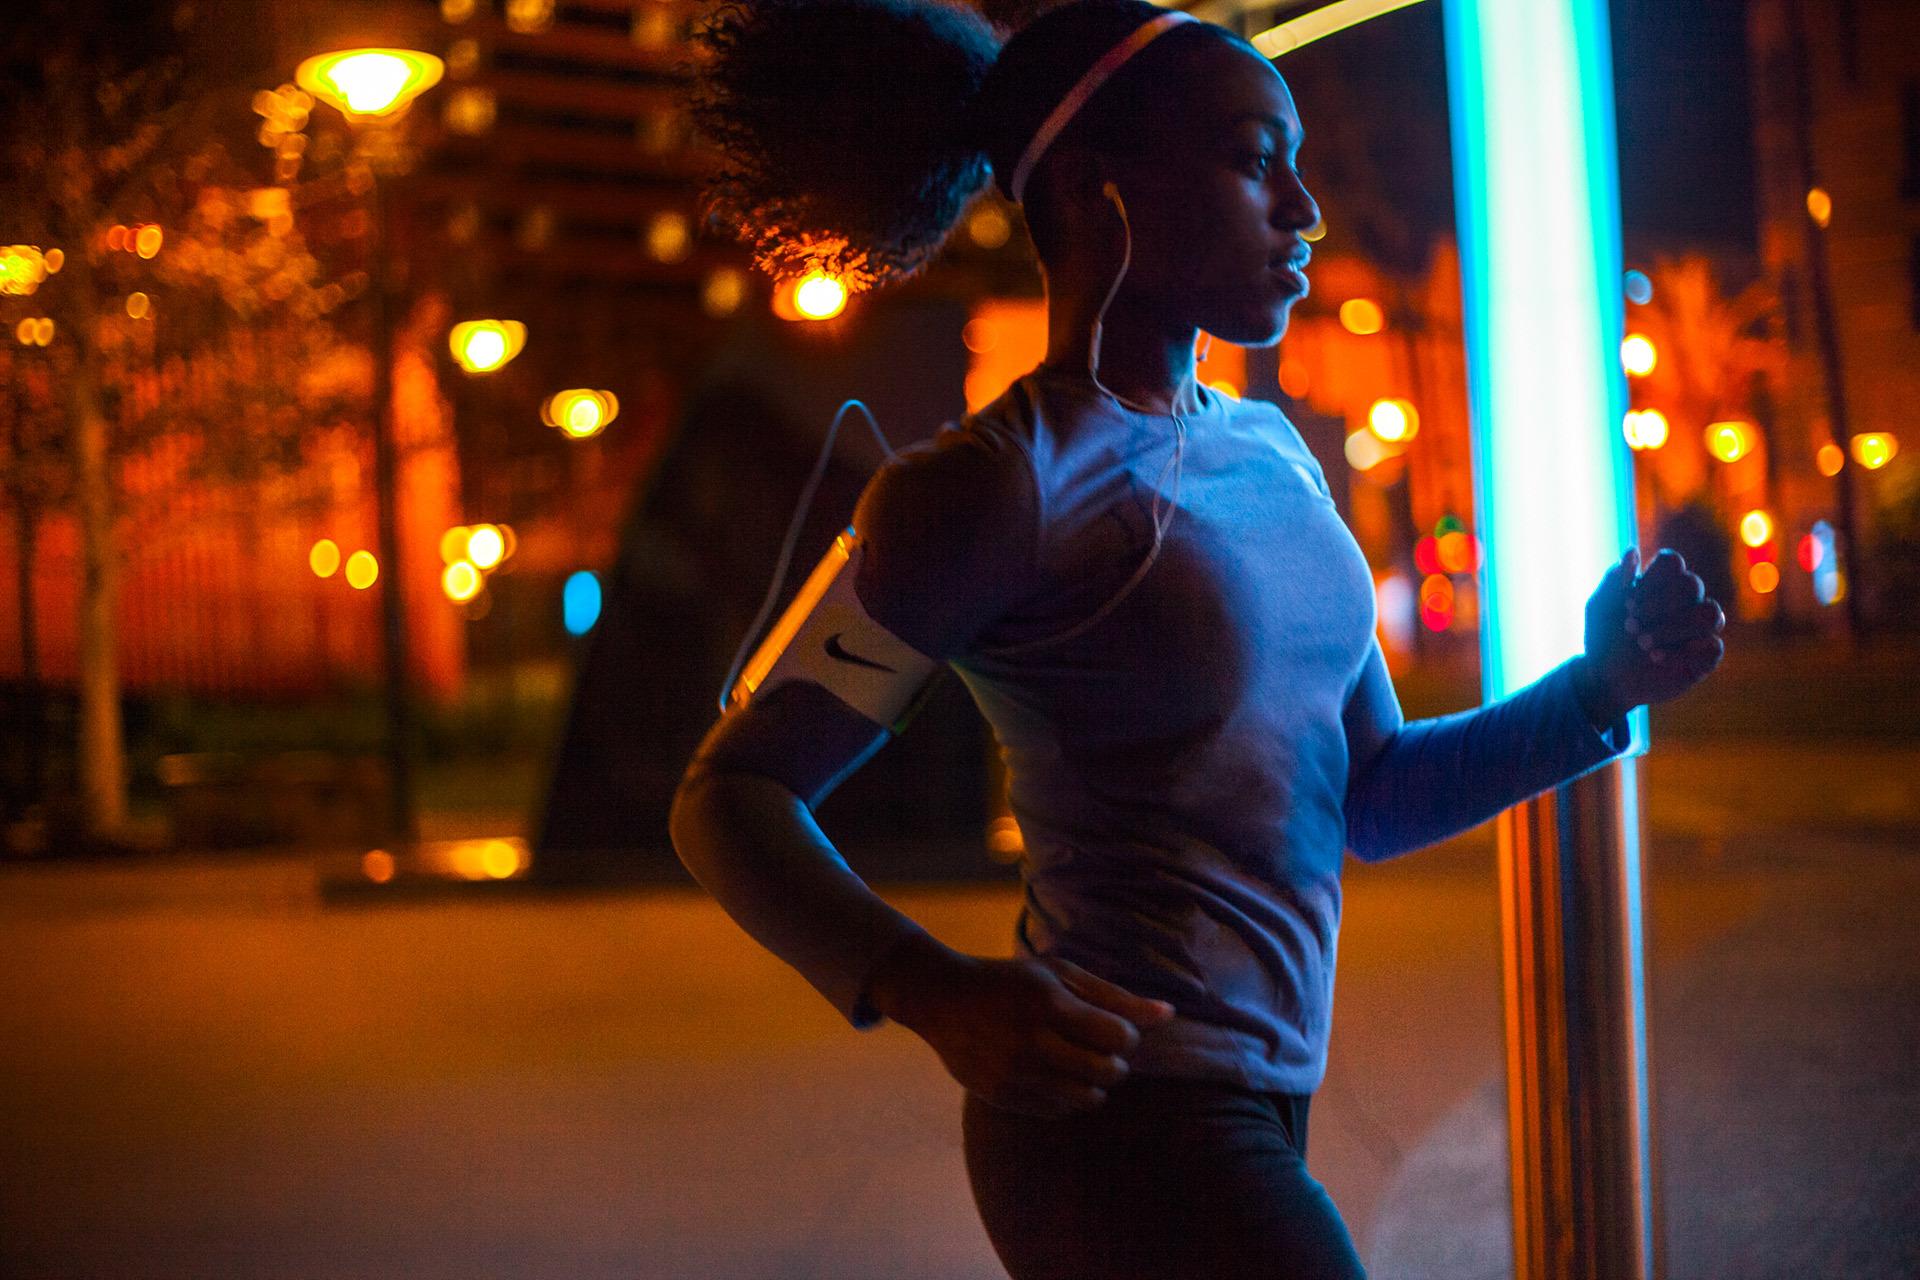 30's something female running through the city at night.